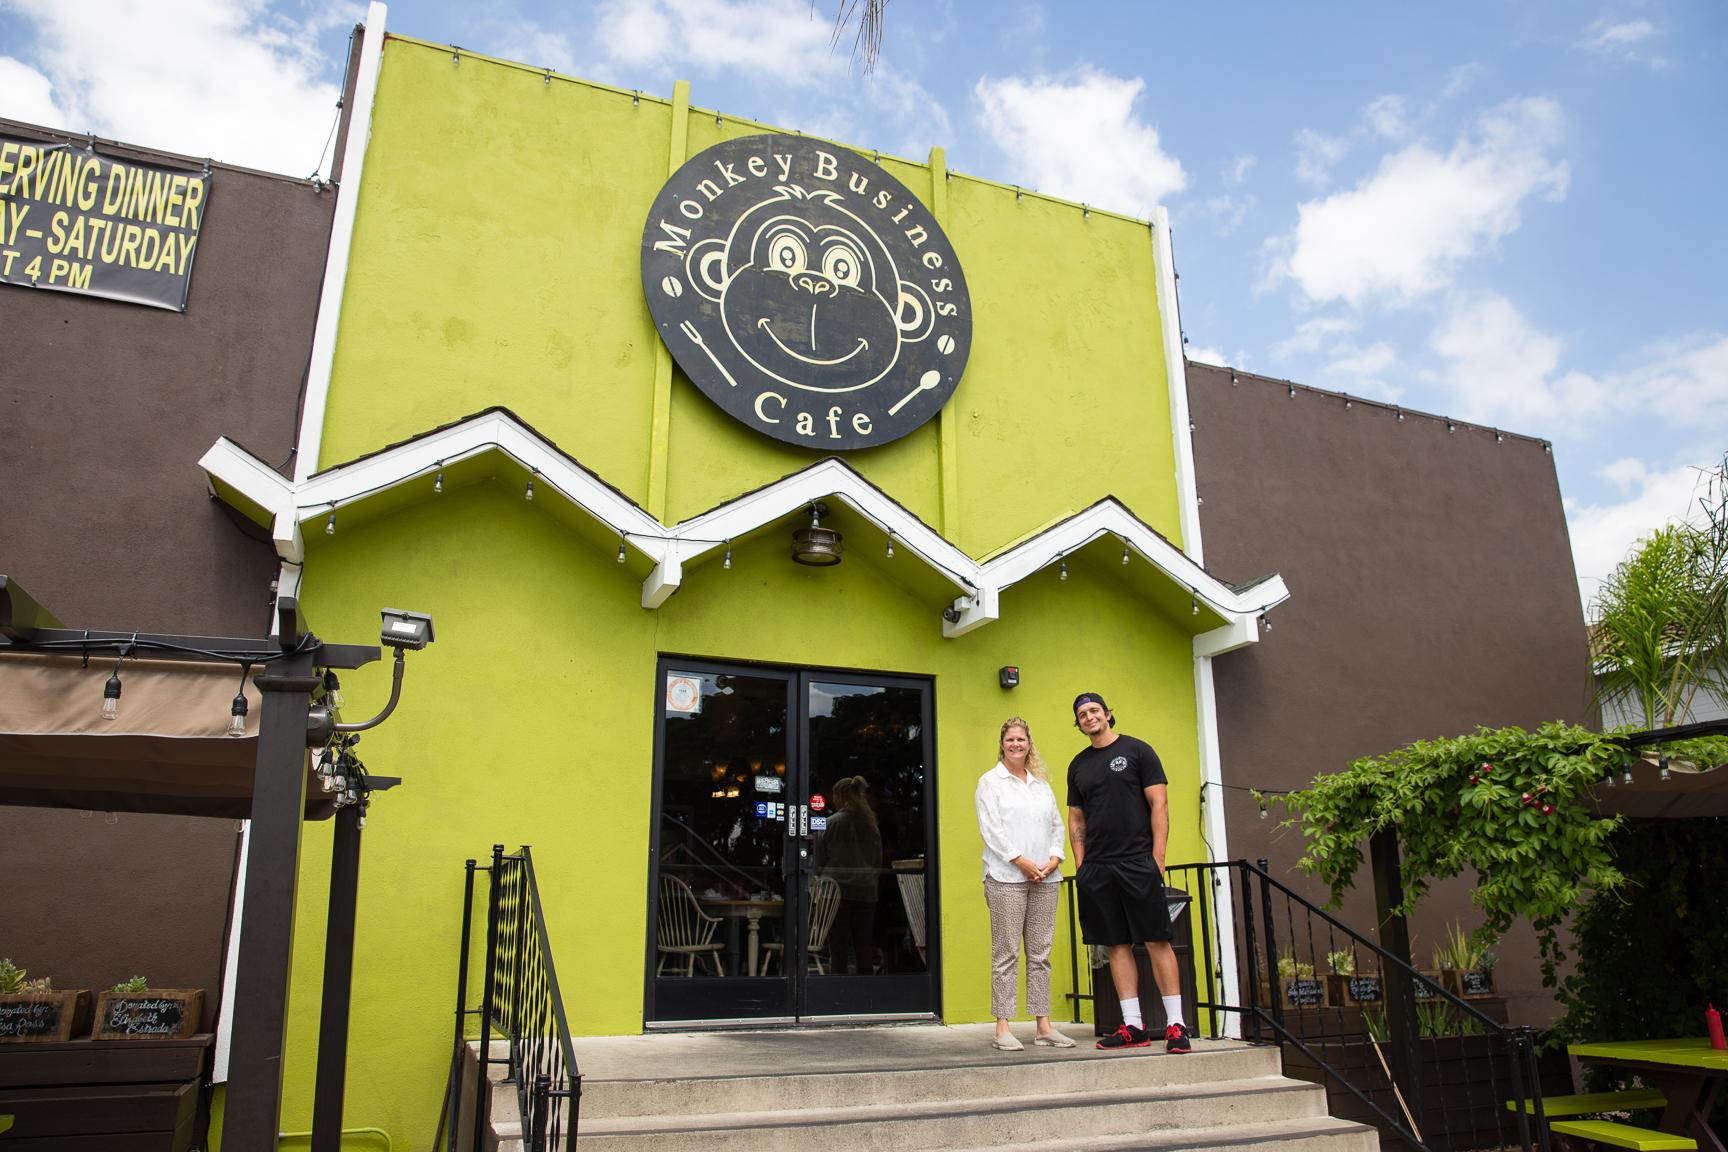 A Café That's More Than Just Food | 3BL Media